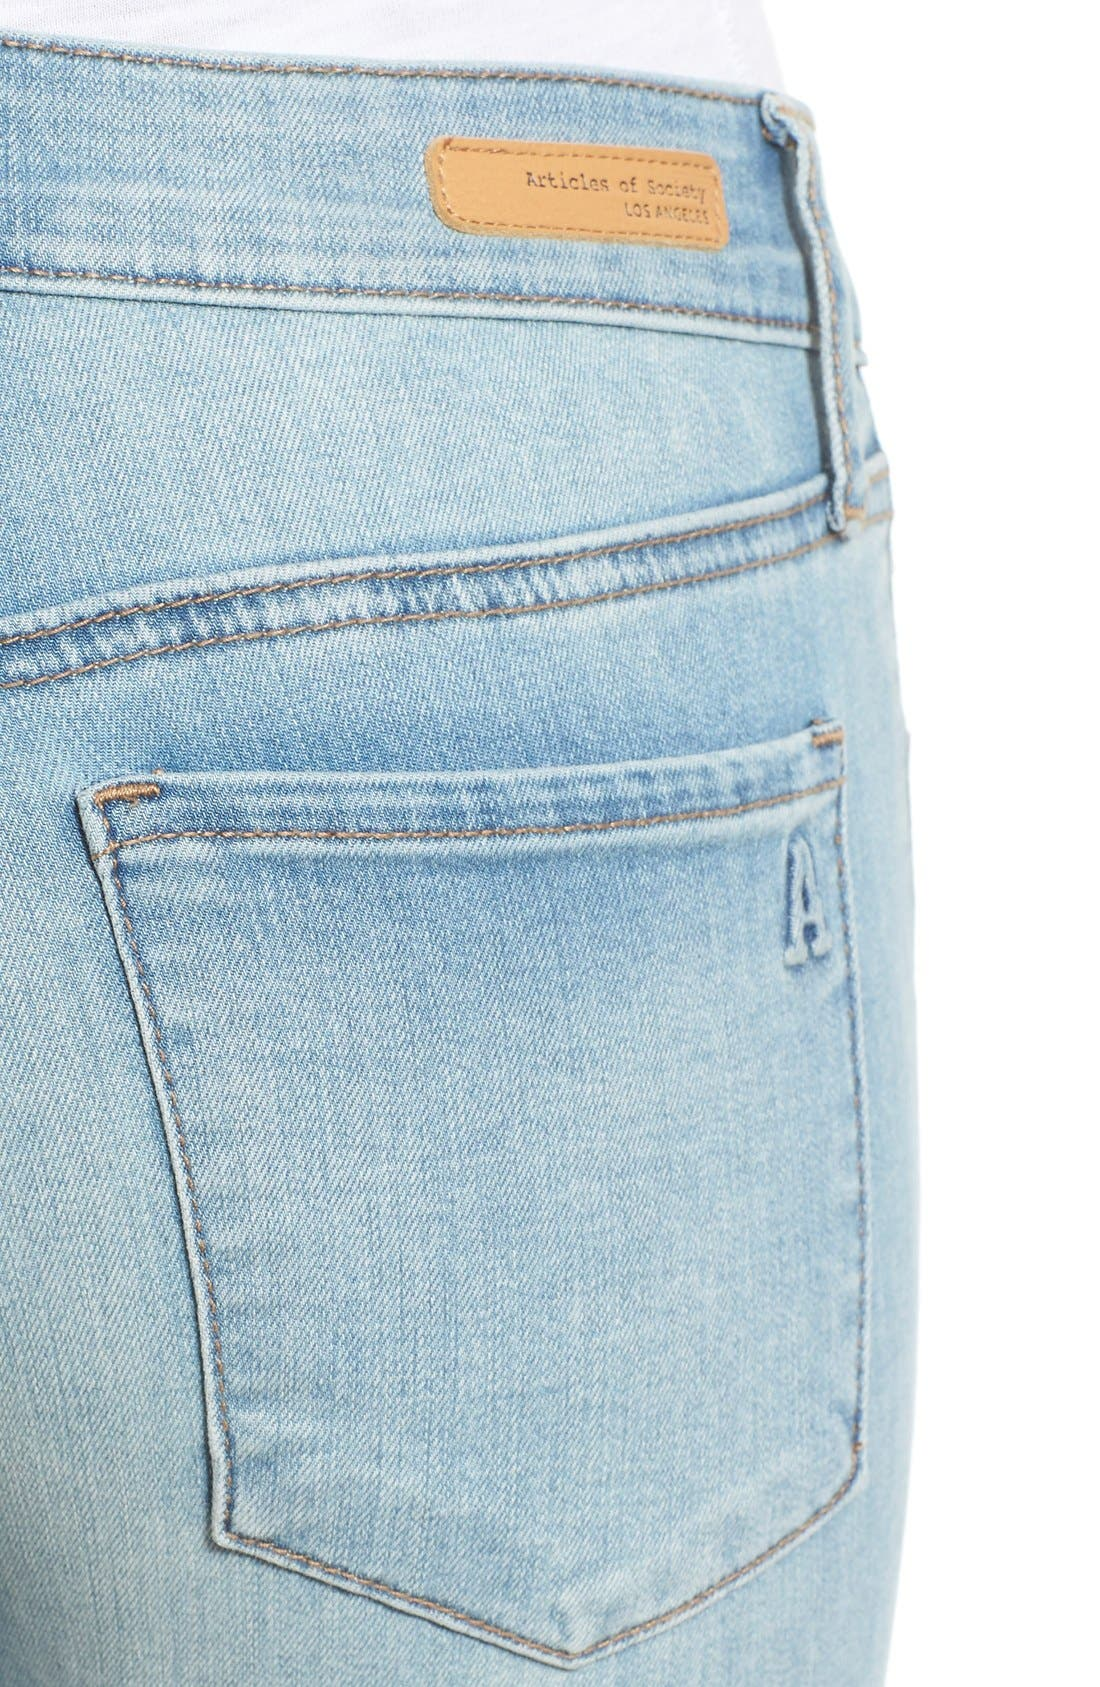 Alternate Image 4  - Articles of Society 'Mya' Skinny Jeans (Indigo Wash)